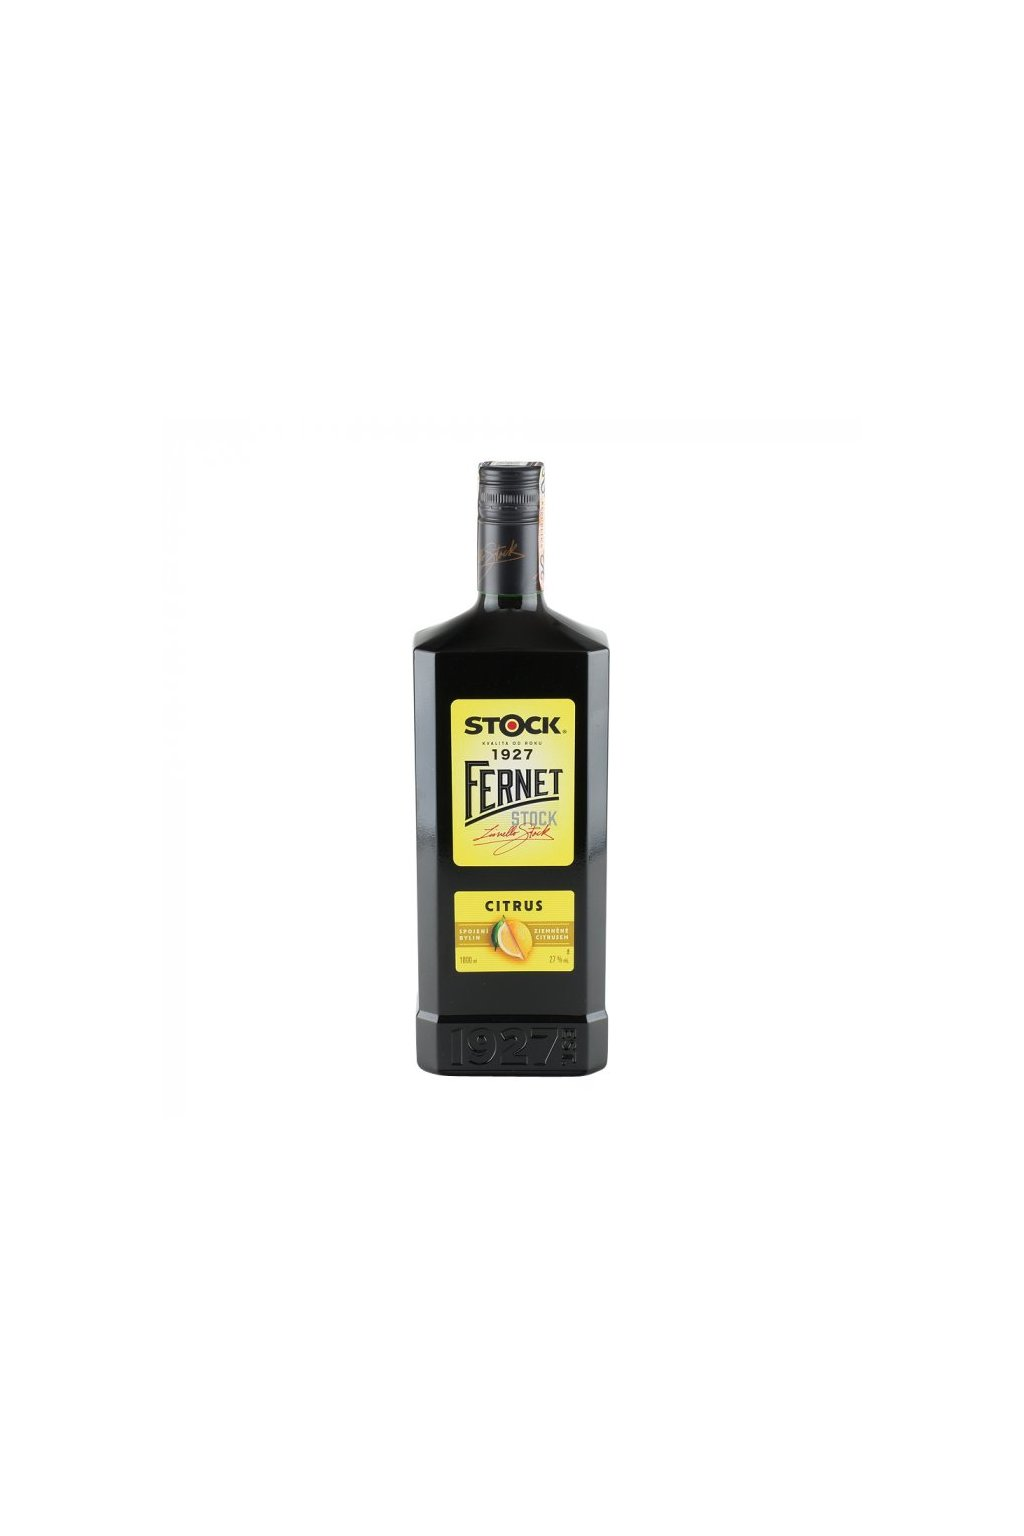 Fernet Stock Citrus